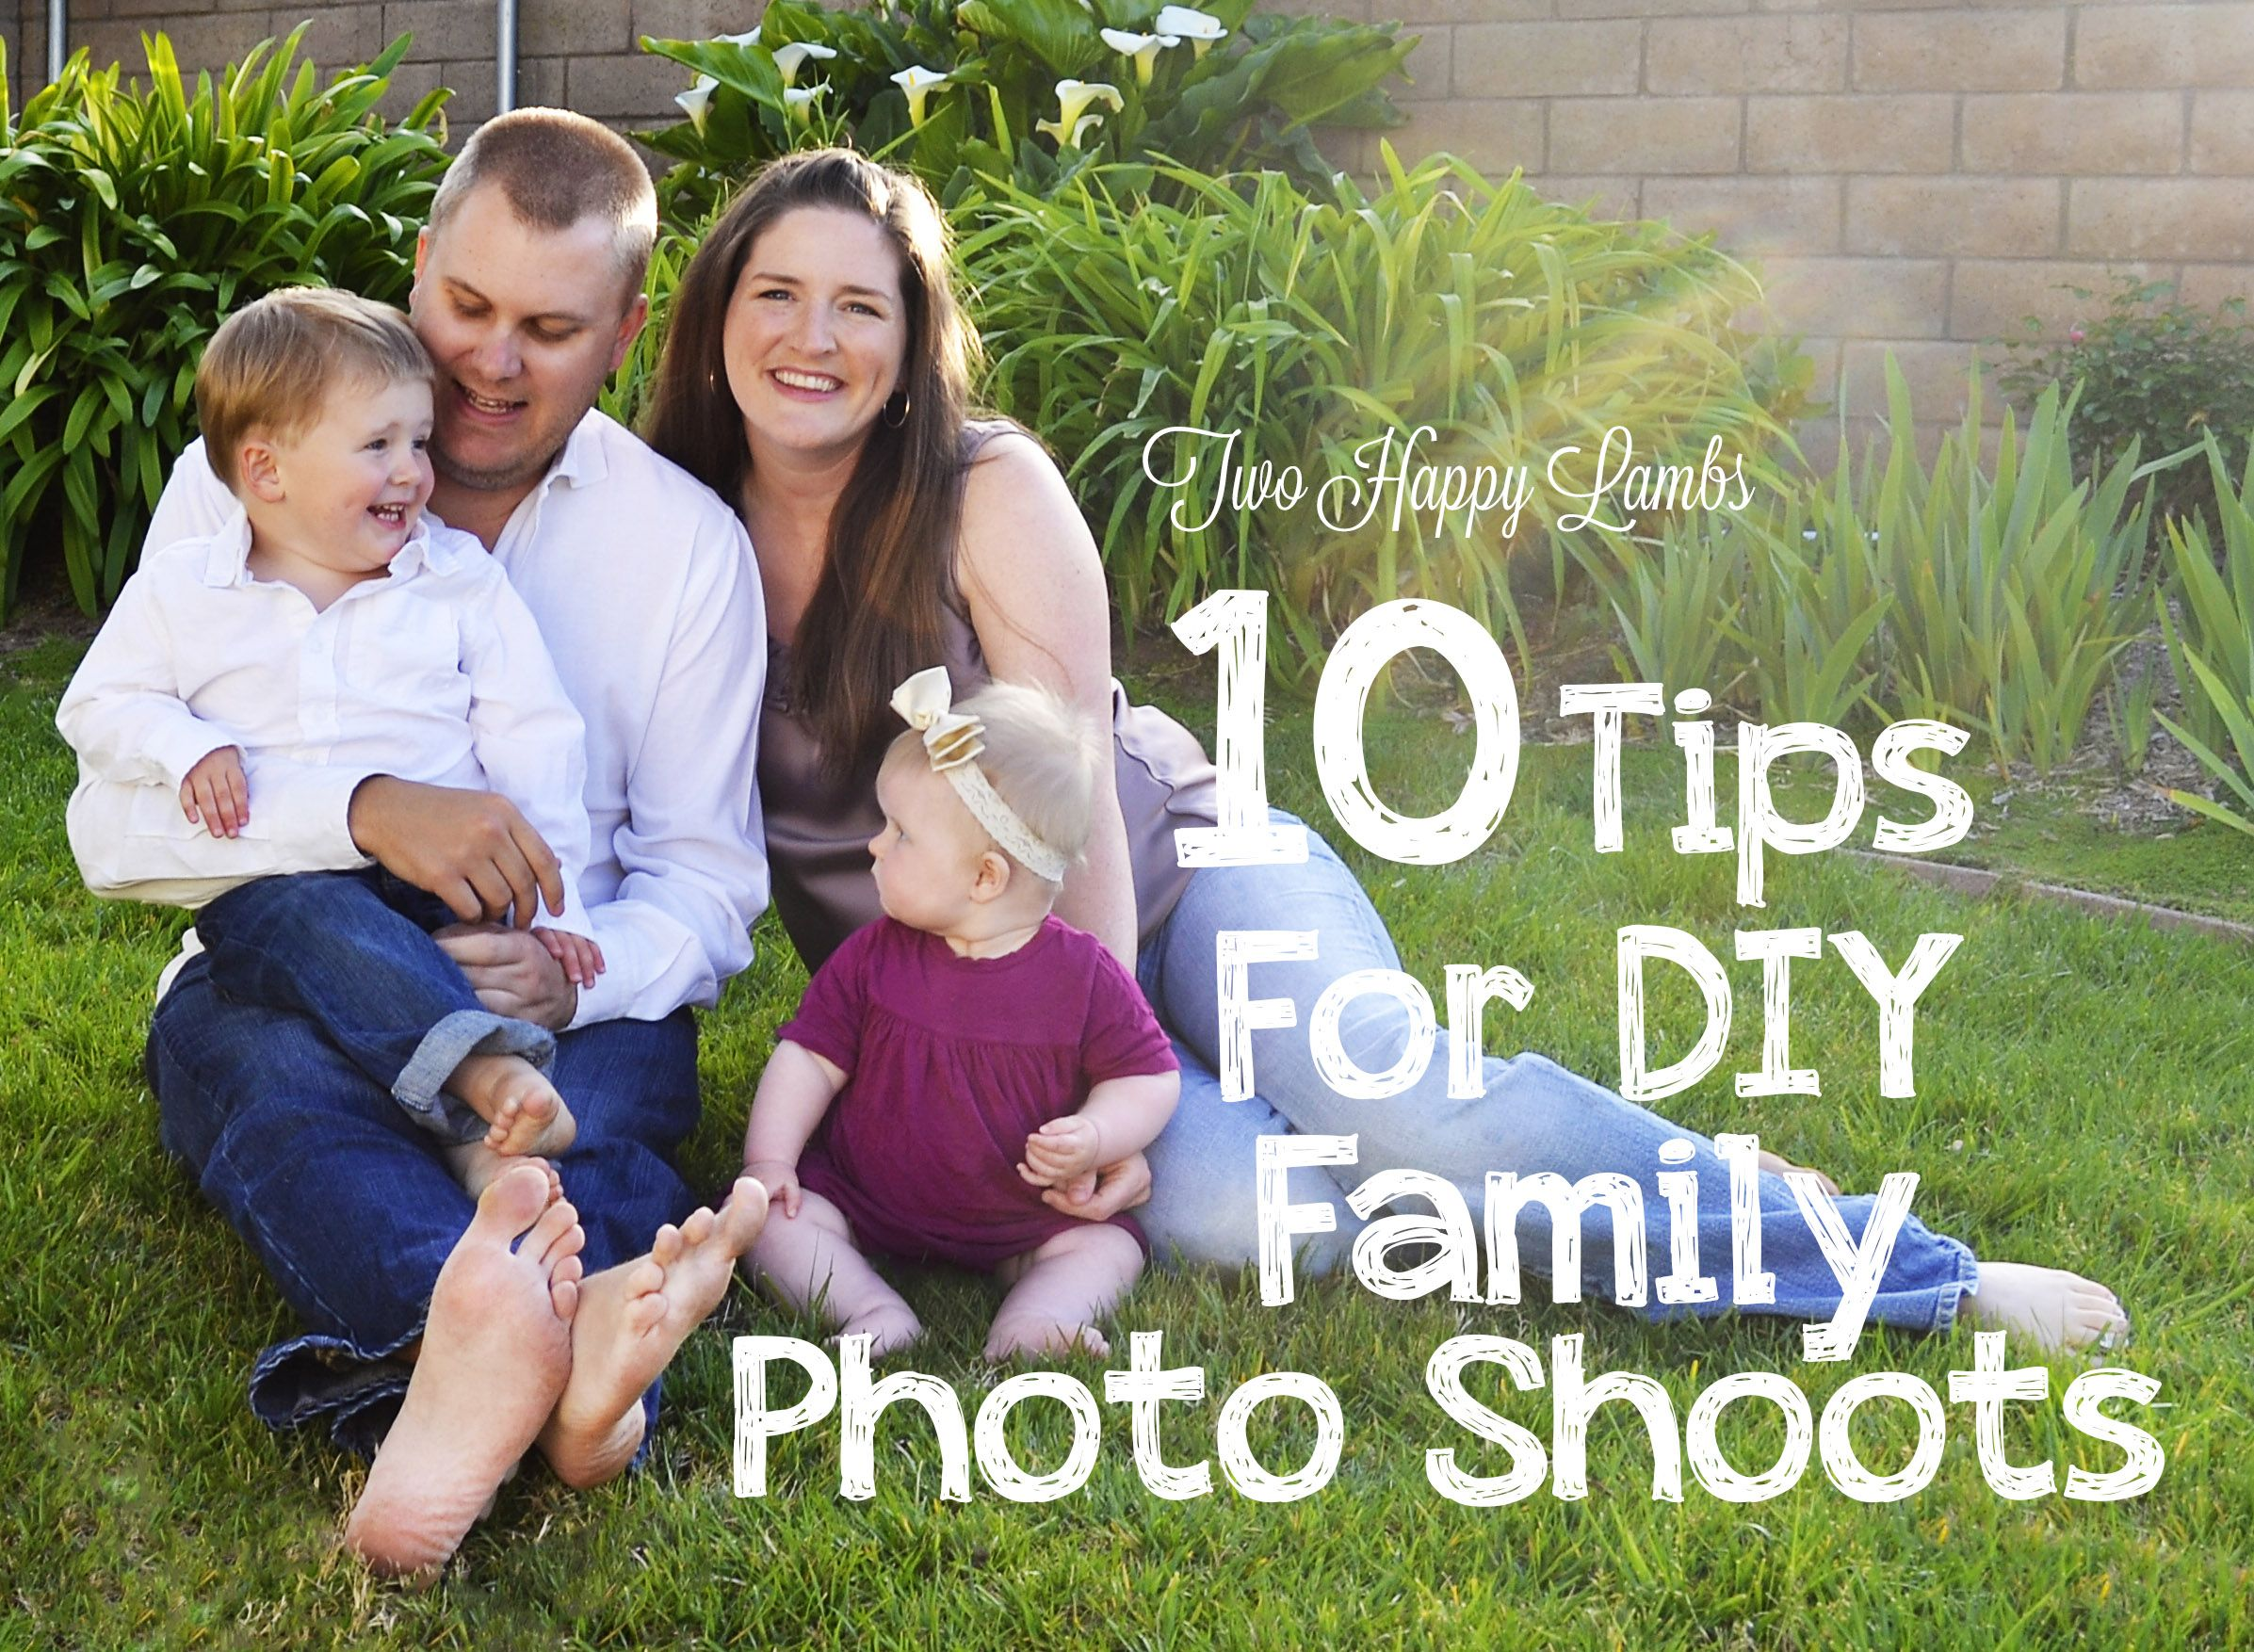 Family Photo Shoot Family Pose Idea 10 Tips For Diy Photo Shoots Allie Pinterest